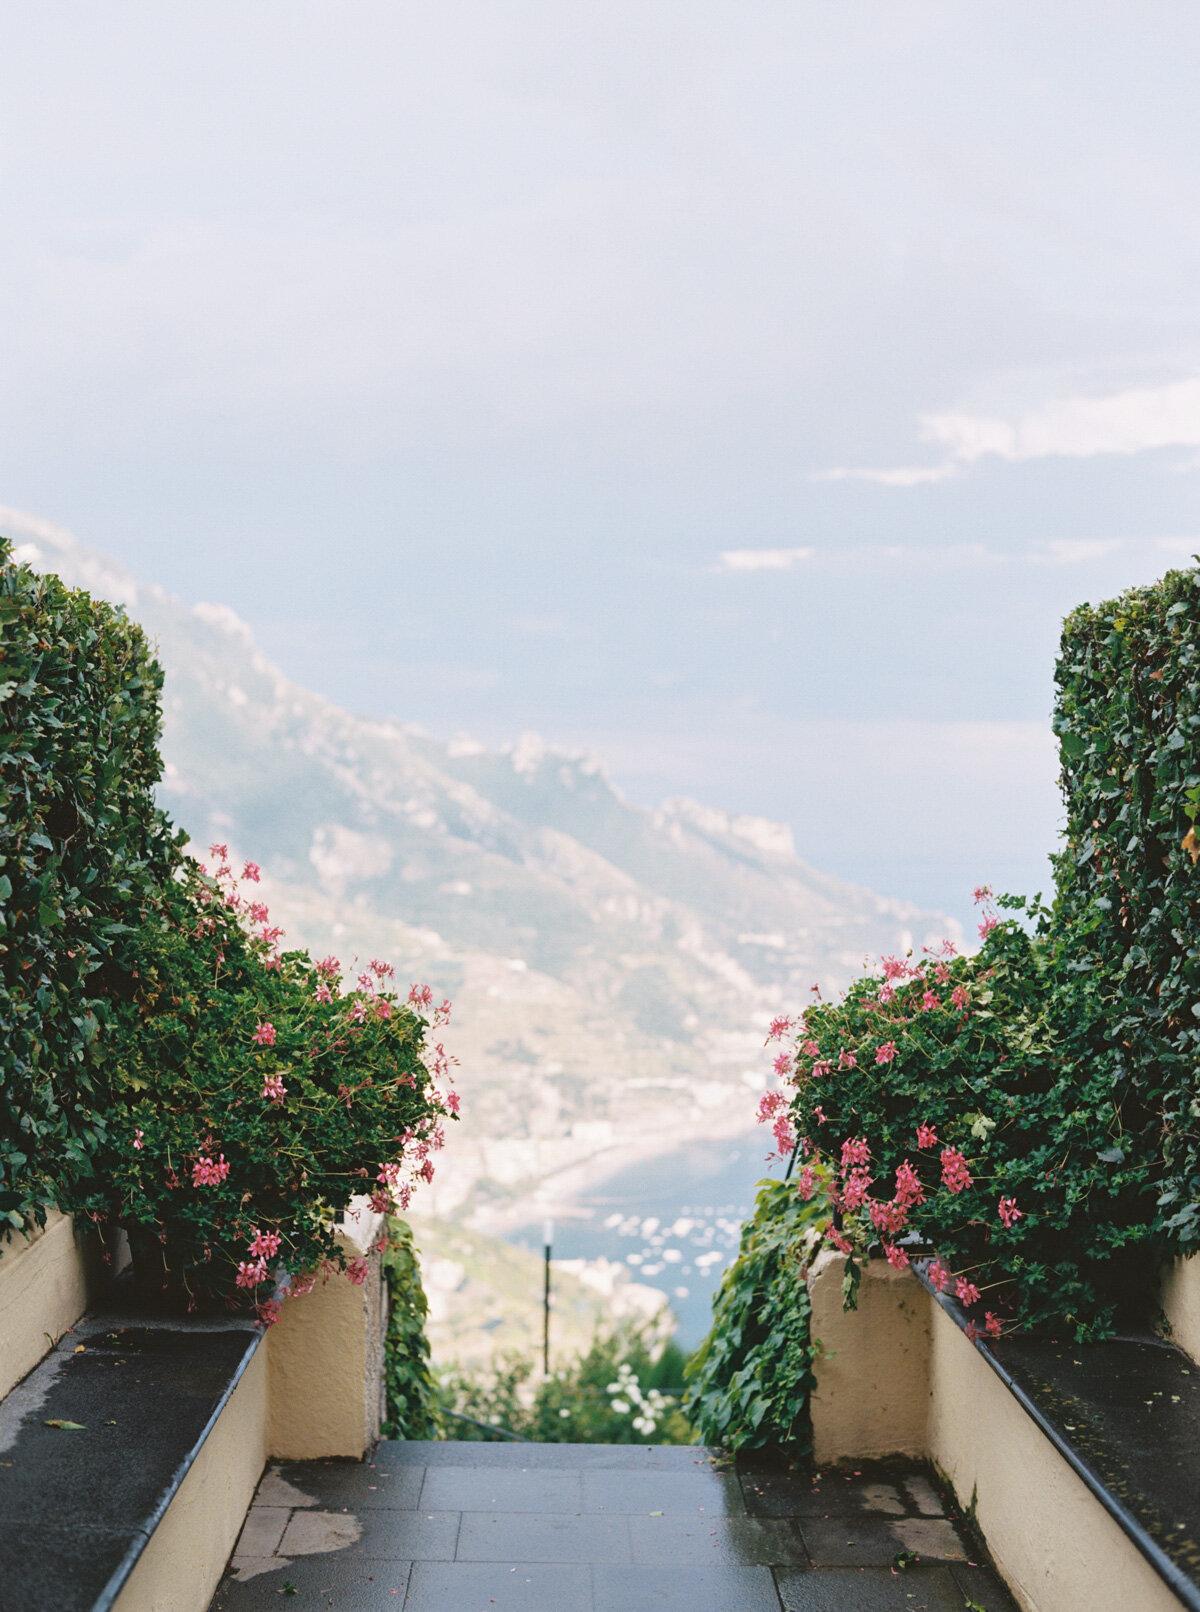 Belmond-Hotel-Caruso-ravello-elopement-Katie-Grant-destination-wedding (18 of 50).jpg